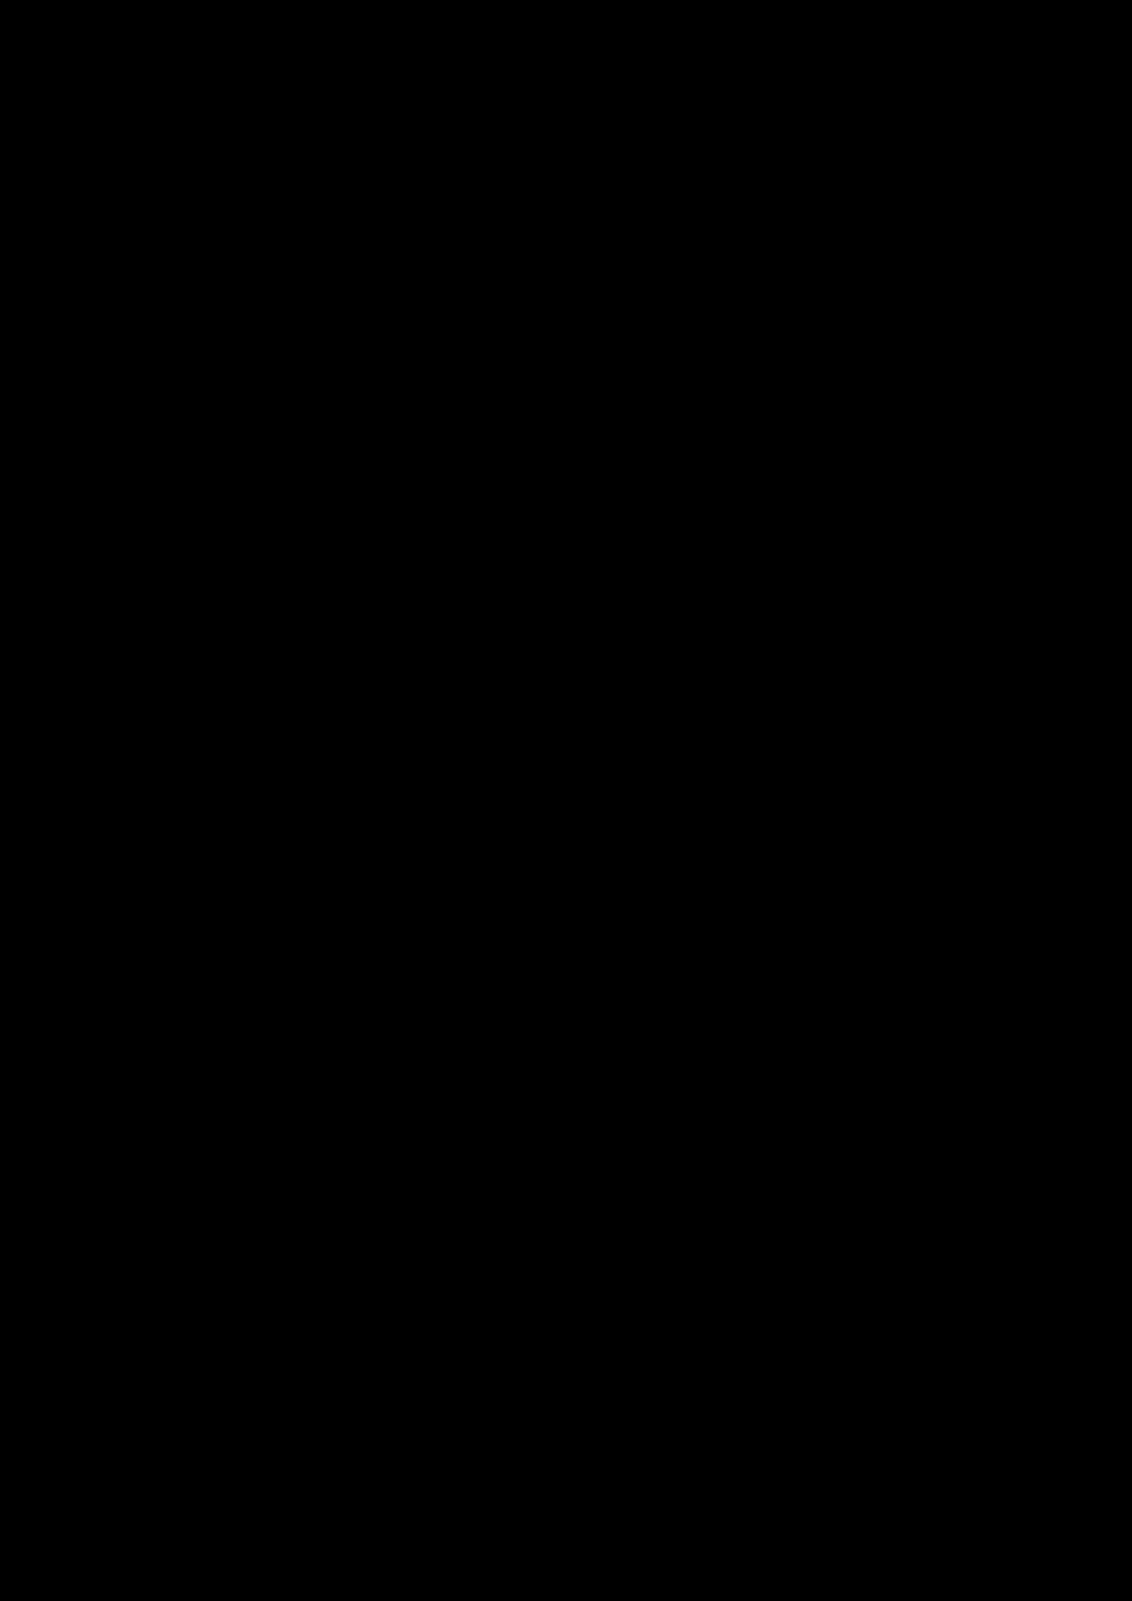 Romans o sleze slide, Image 17